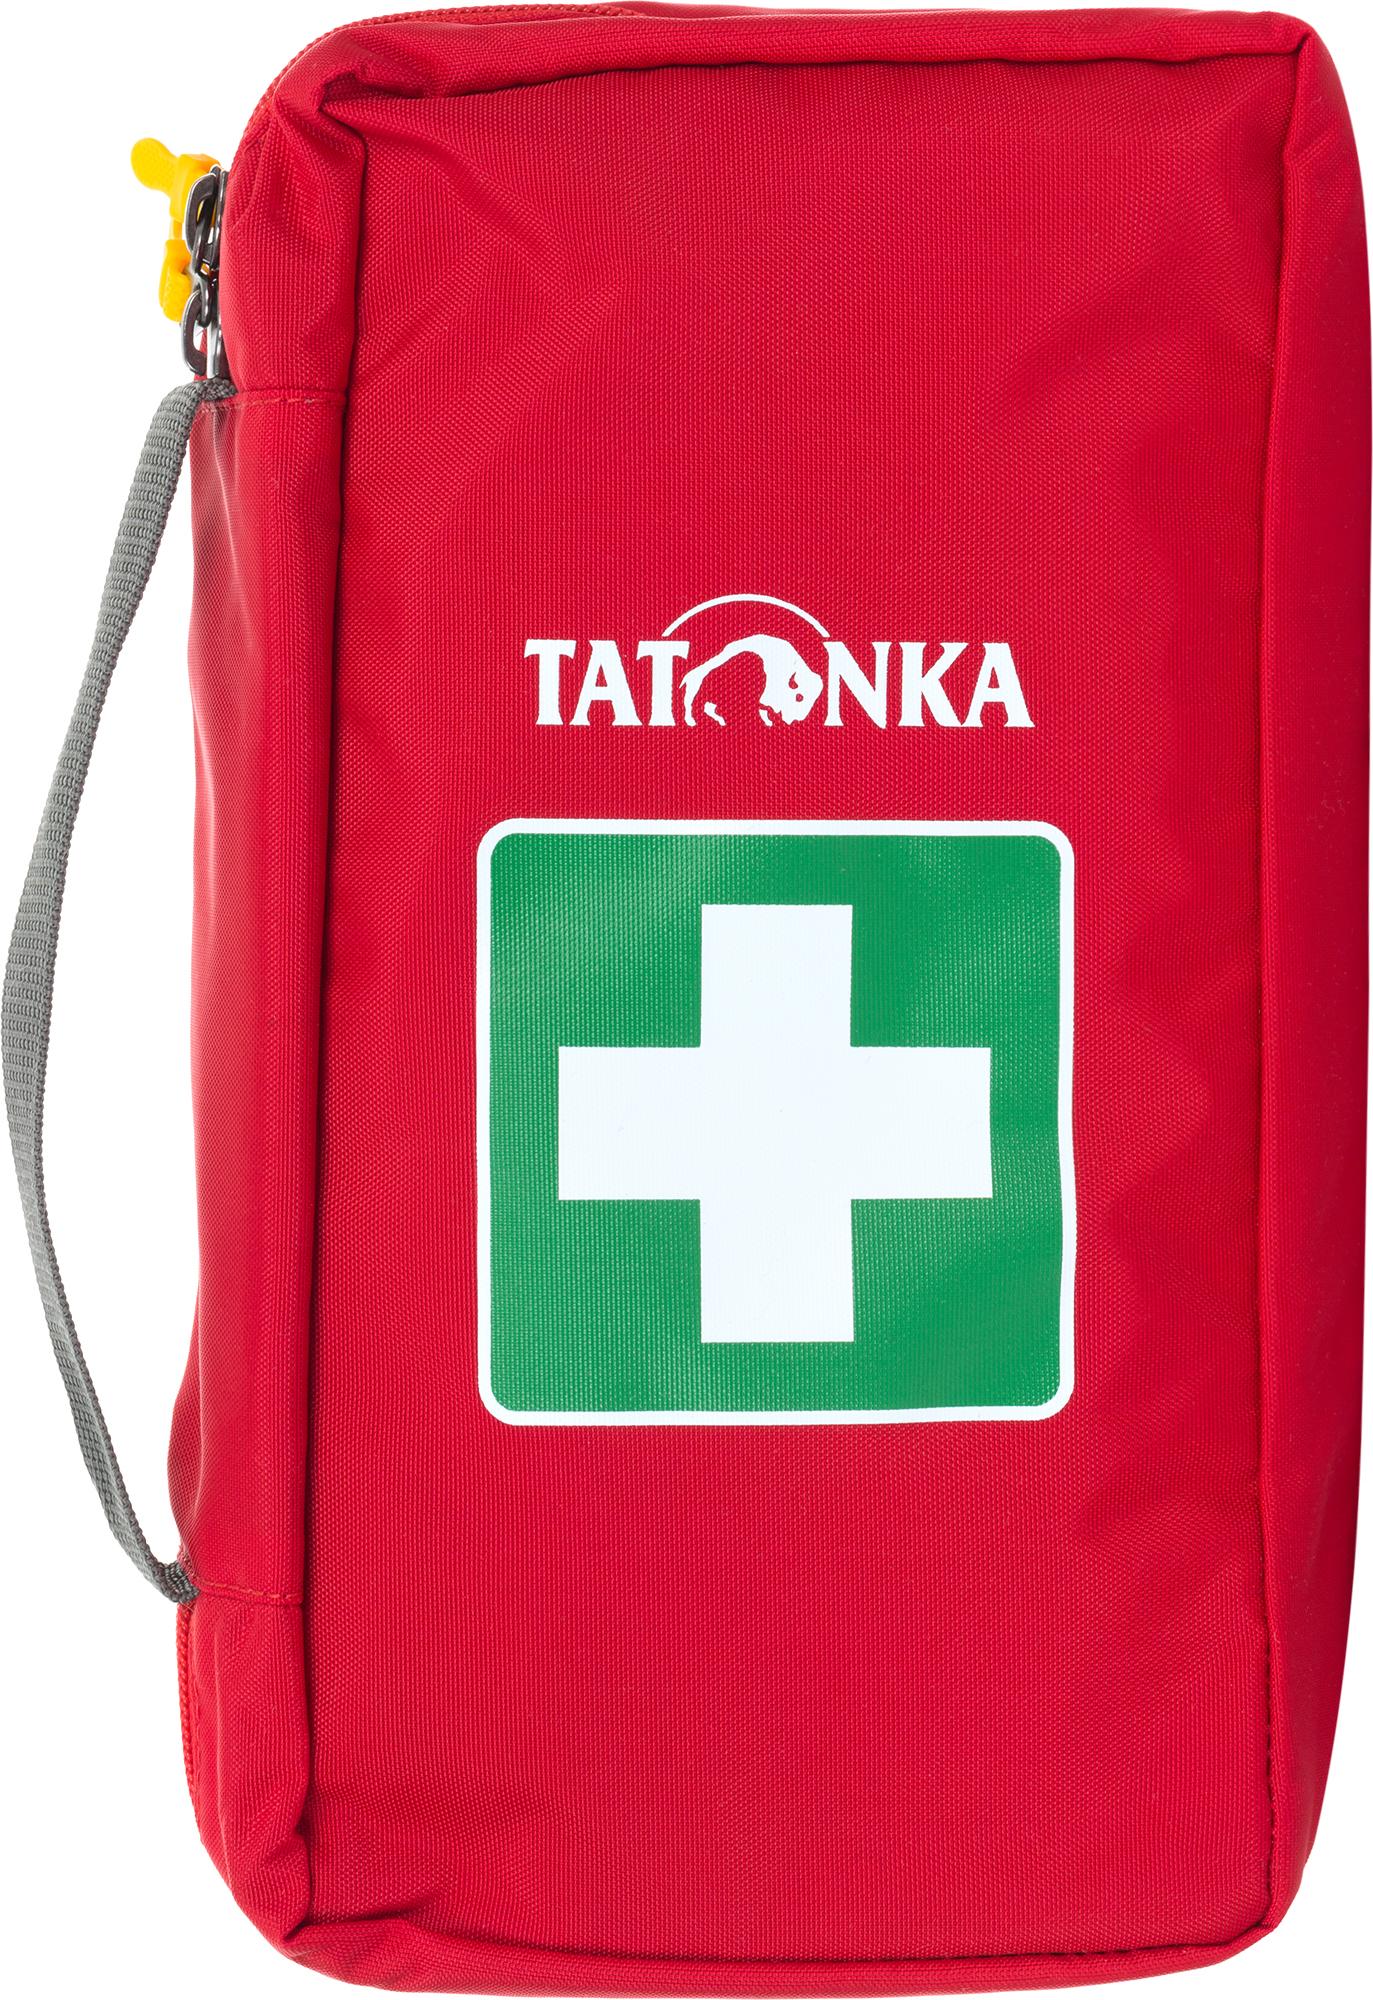 цена на Tatonka Аптечка Tatonka First Aid M